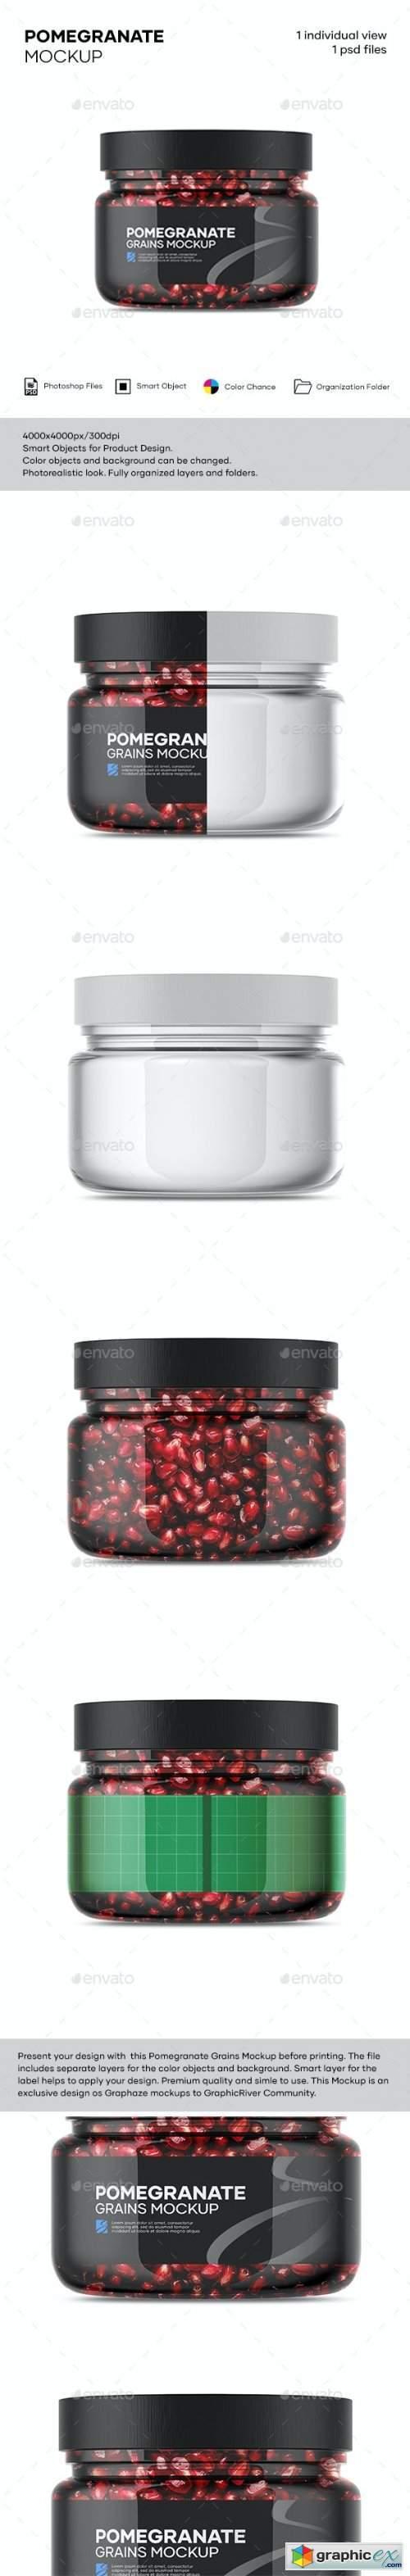 Pomegranate Mockup